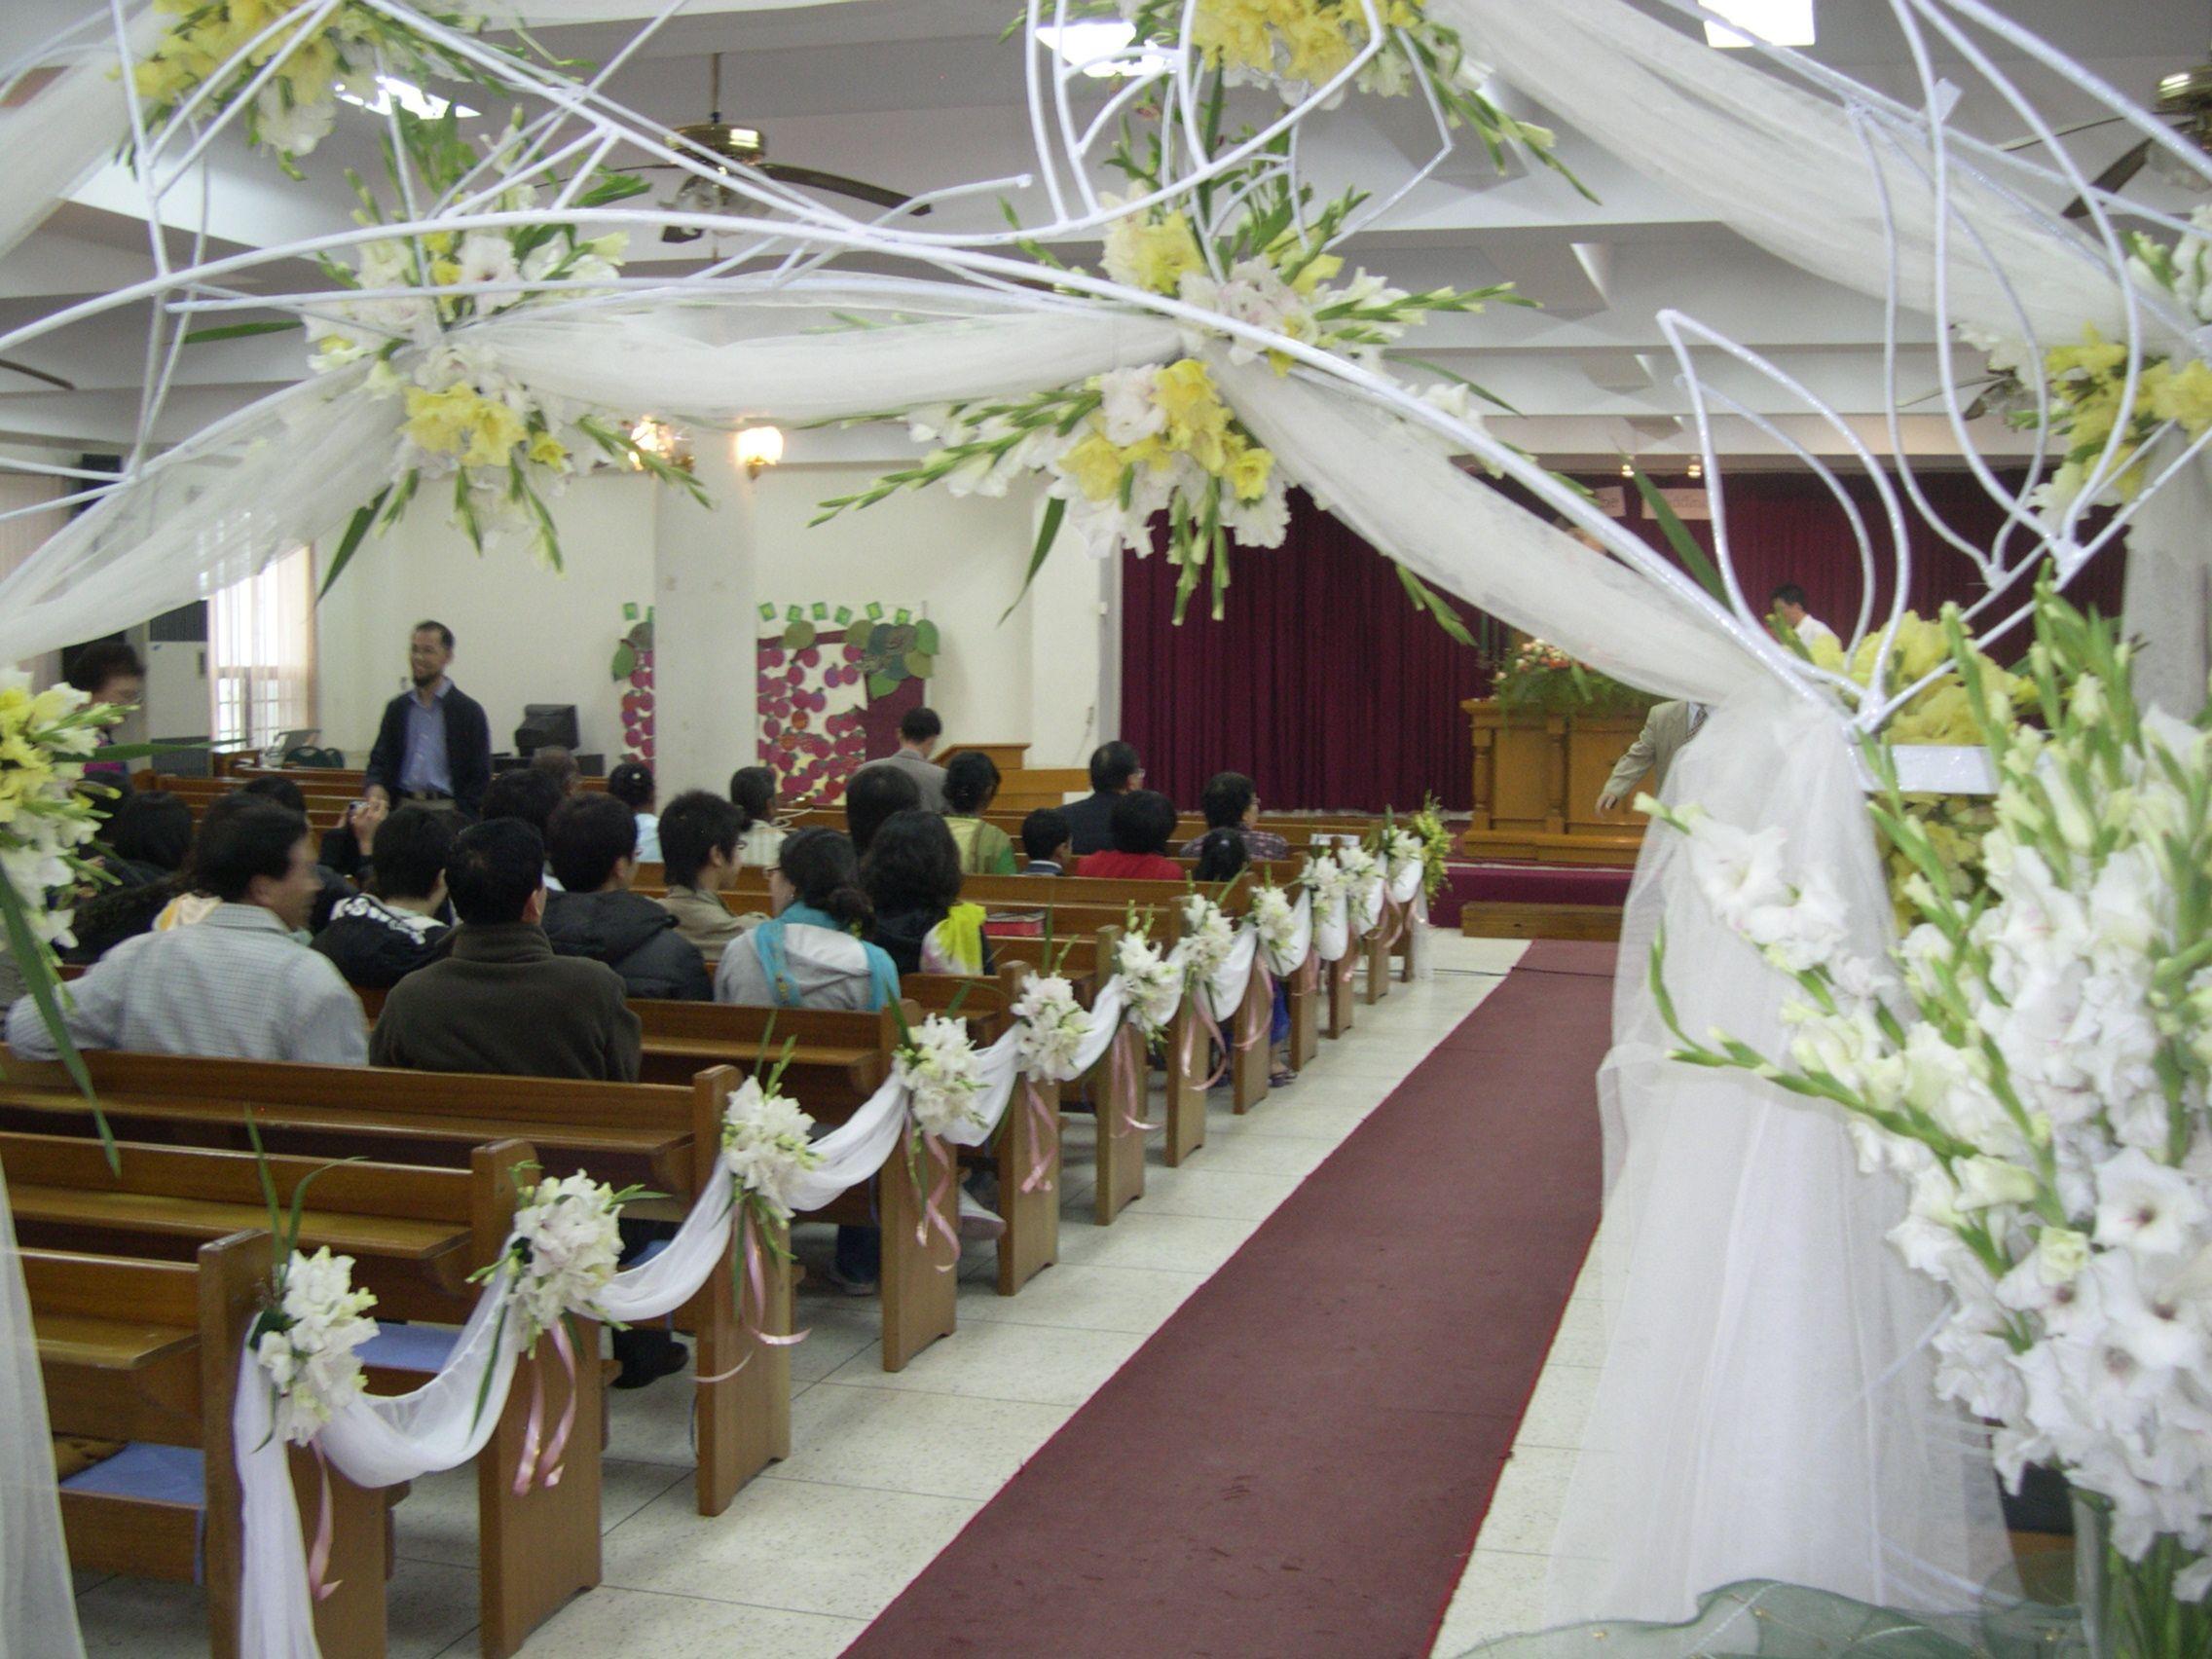 church items ideas cheap wedding decorations things to mark pews at weddings Church Pews Wedding Decorations Wedding Decorations